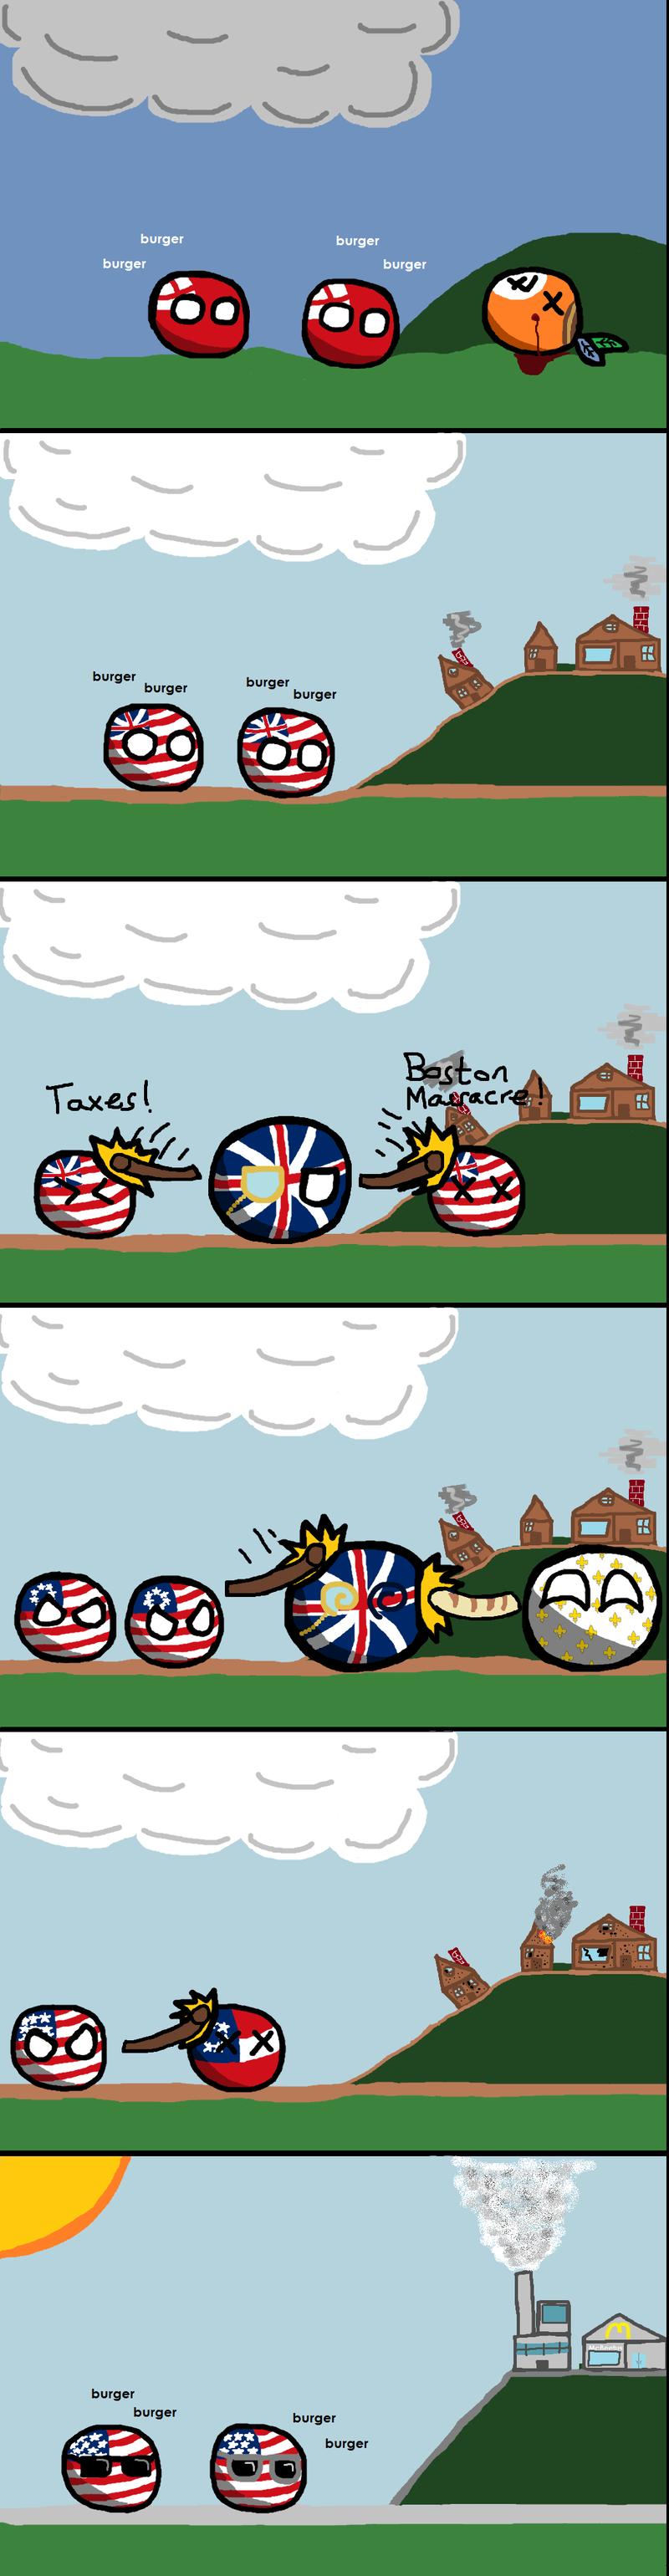 Daily Polandball: A brief history of the United States.